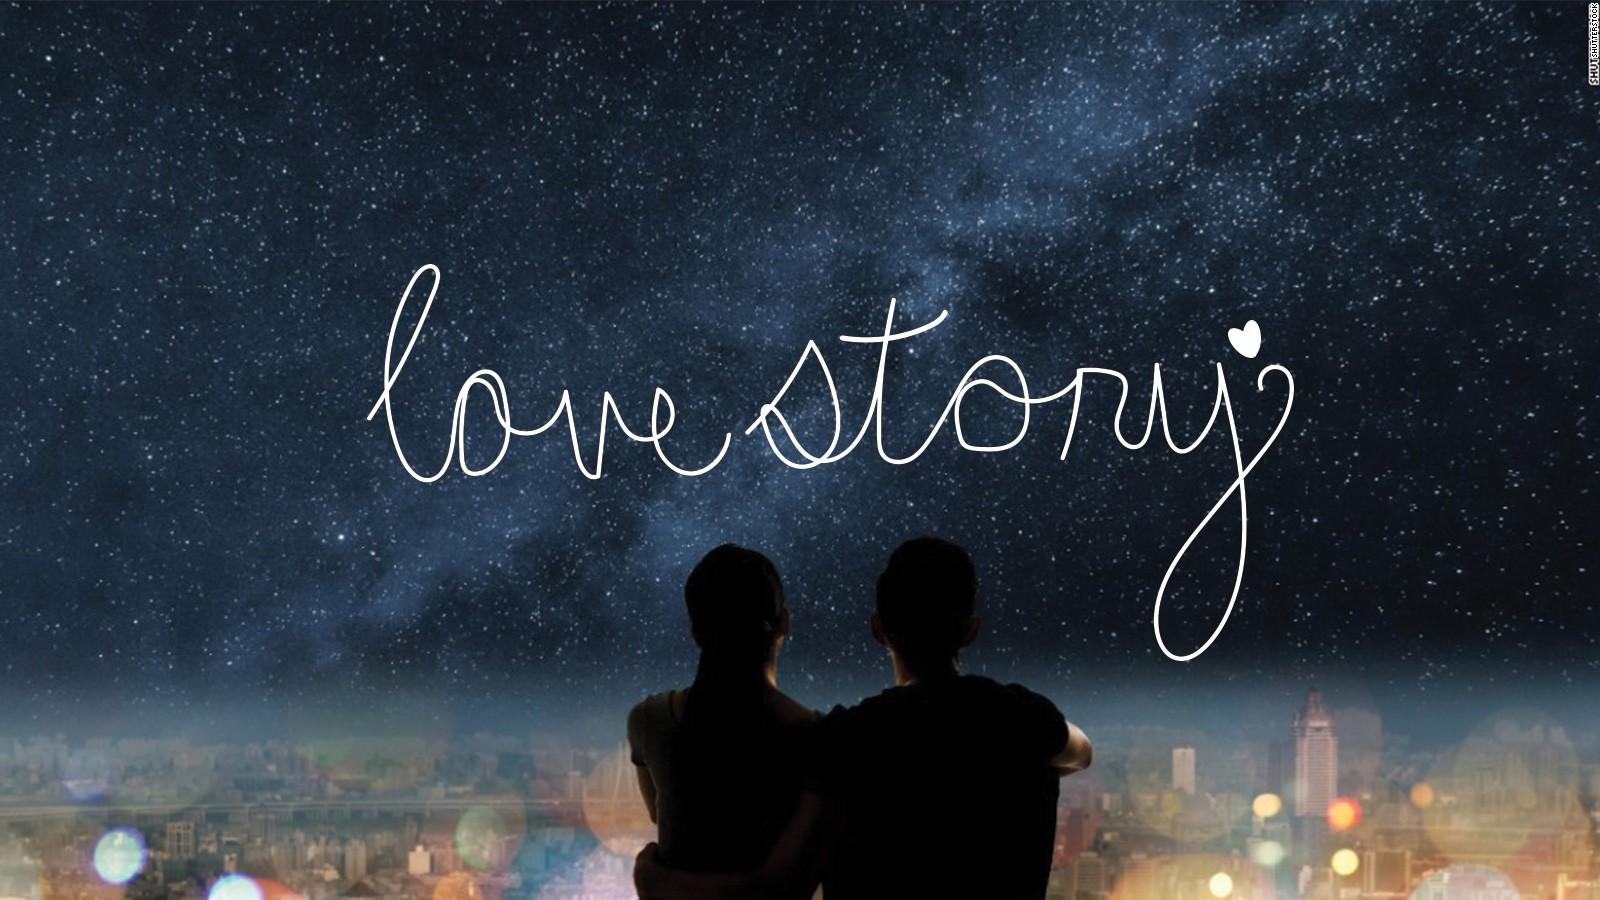 love story i love you part2 steemit. Black Bedroom Furniture Sets. Home Design Ideas